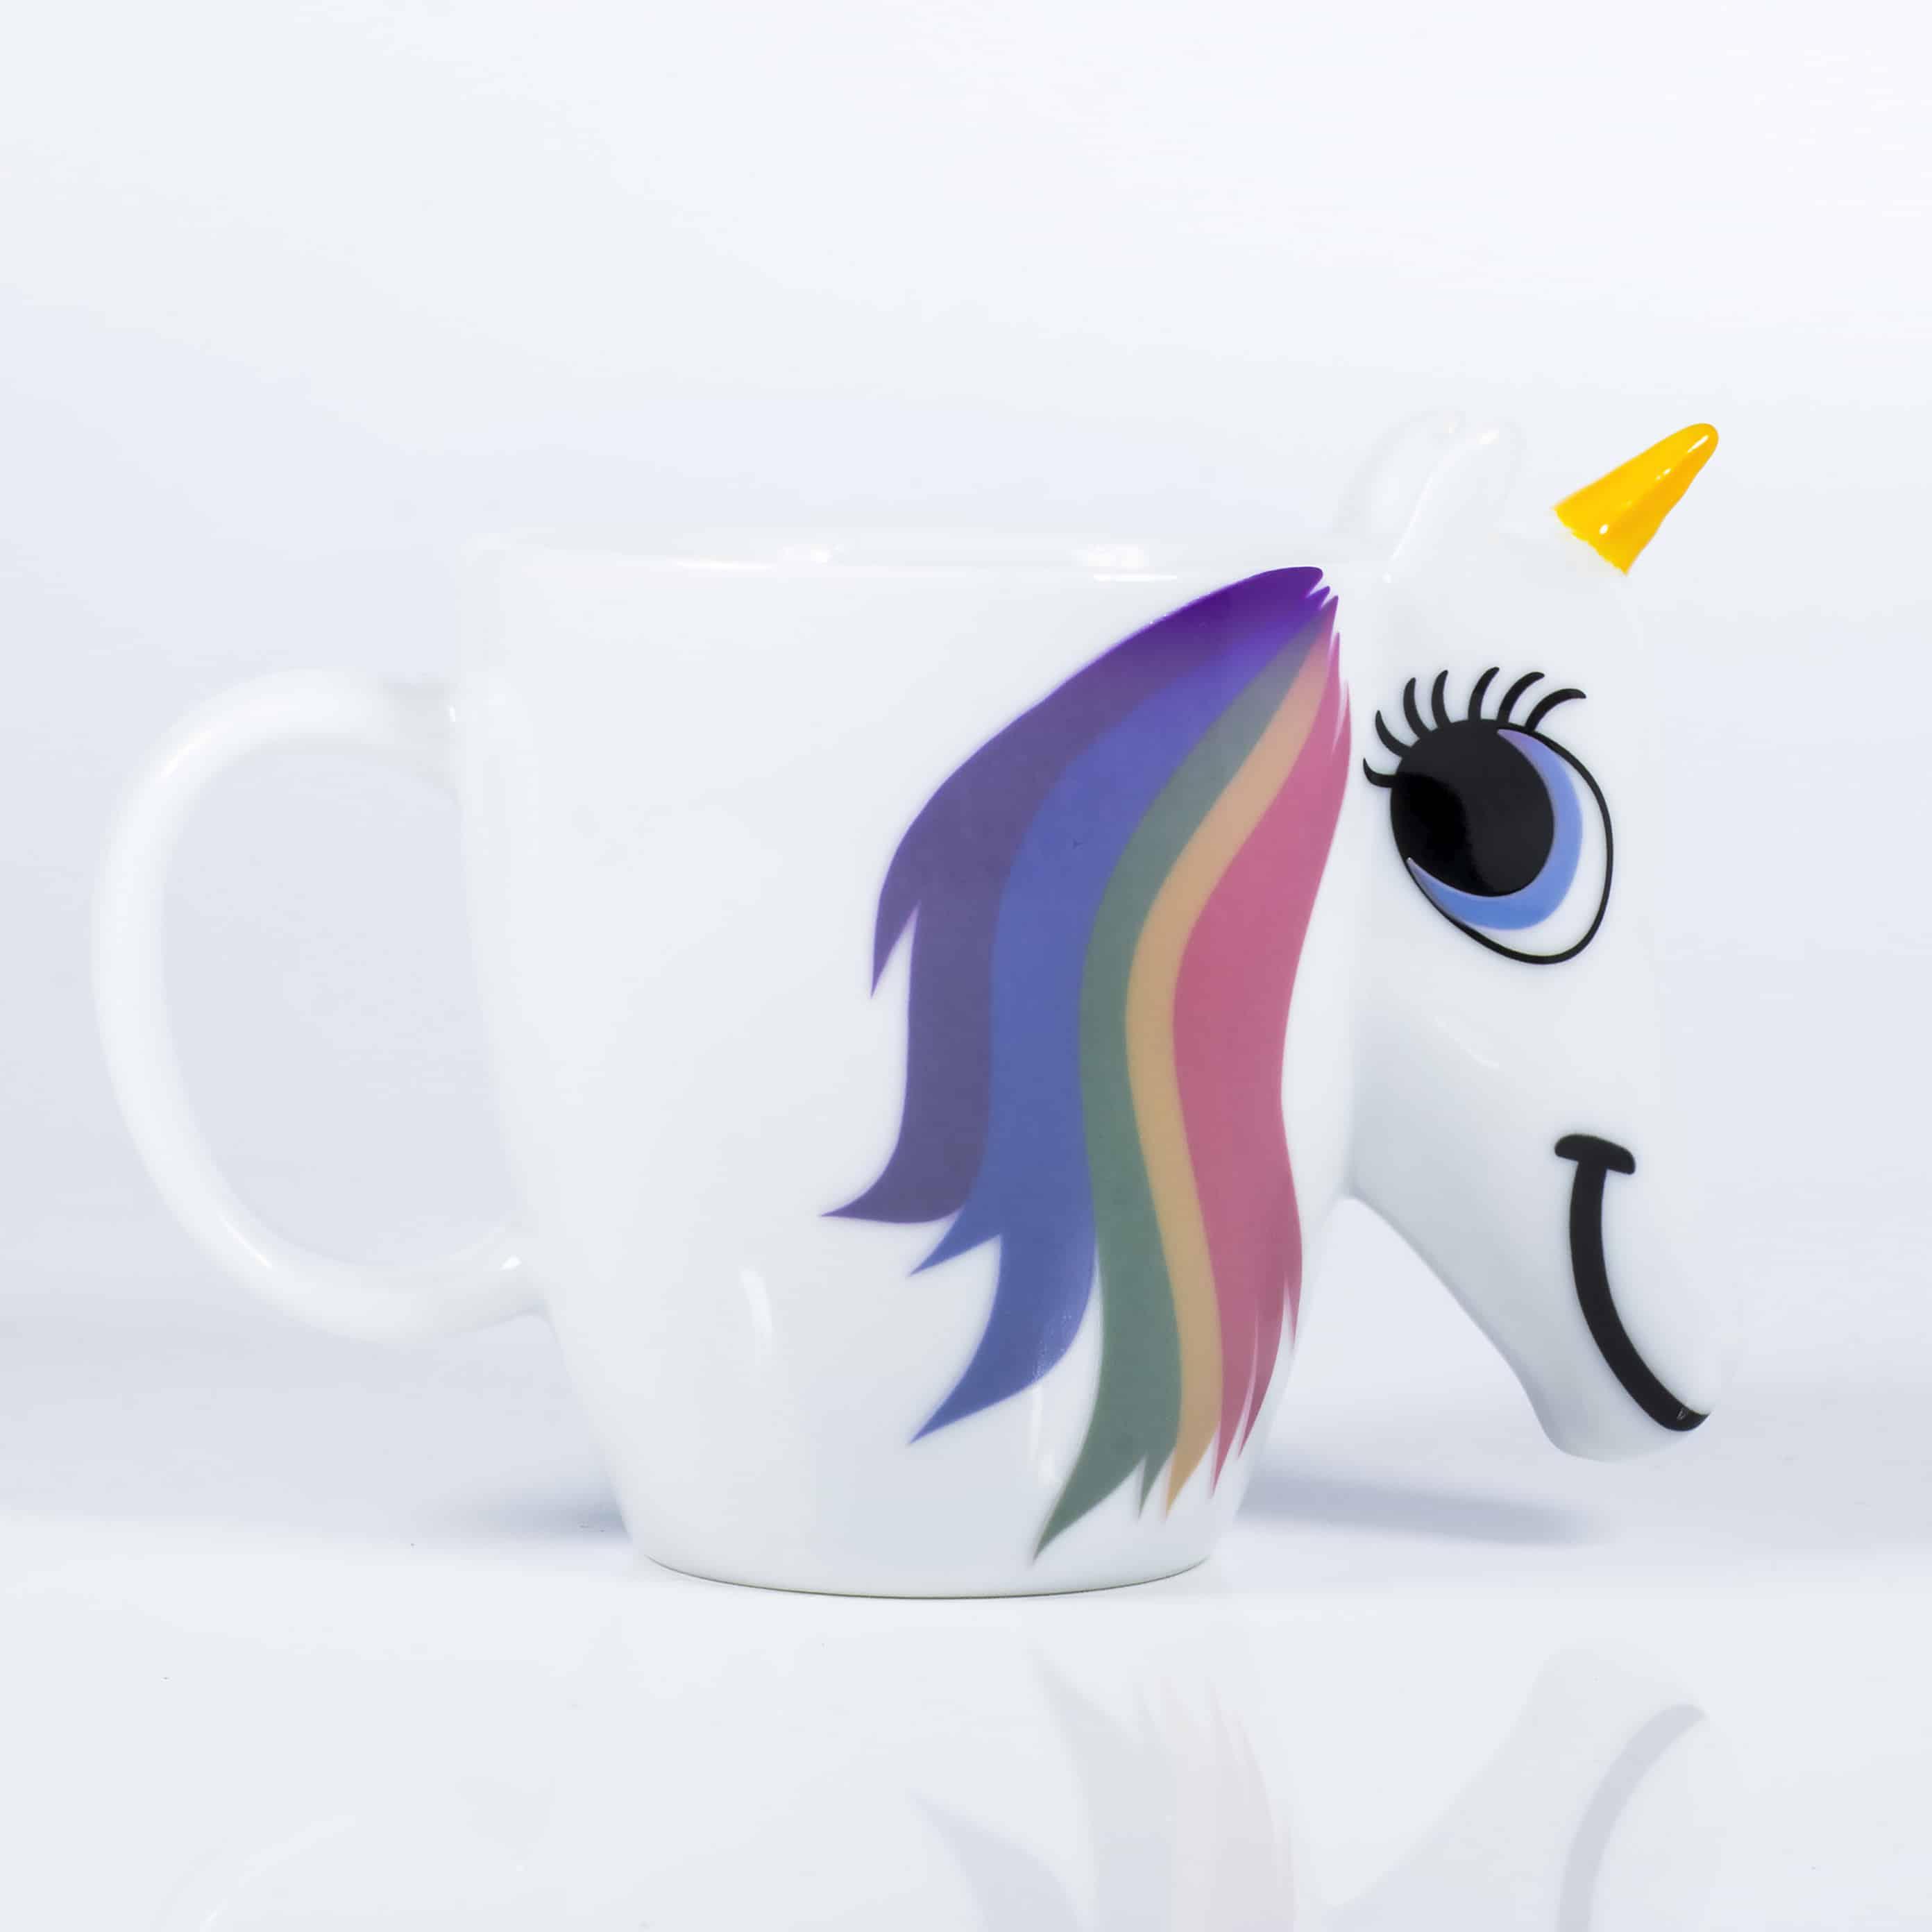 mug licorne qui change de couleur super insolite. Black Bedroom Furniture Sets. Home Design Ideas